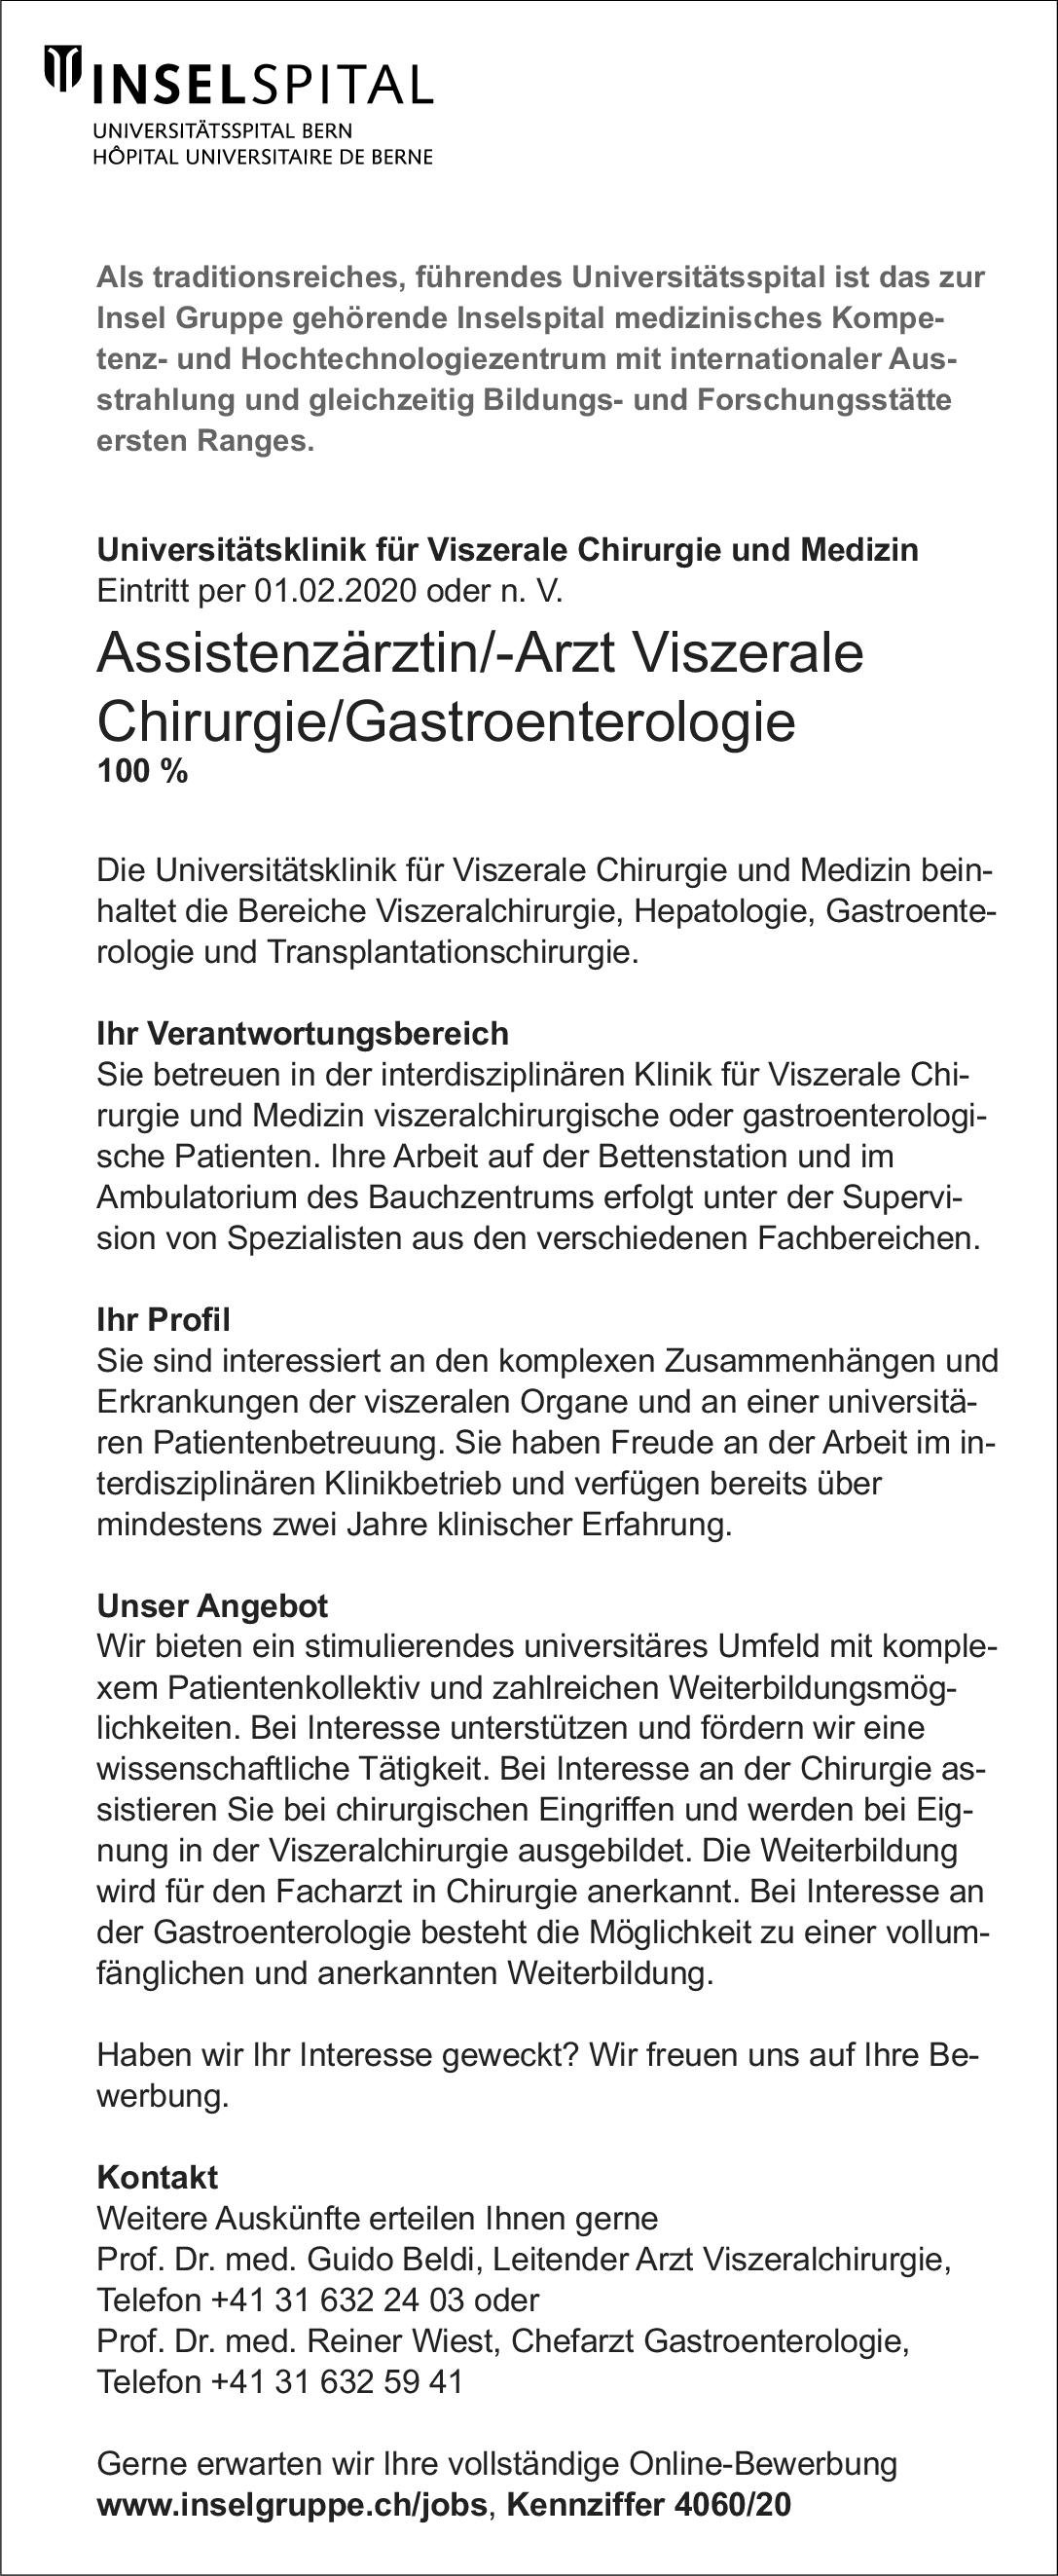 Universitätsspital Bern Assistenzärztin/-Arzt Viszerale Chirurgie/Gastroenterologie  Innere Medizin und Gastroenterologie, Viszeralchirurgie, Chirurgie Assistenzarzt / Arzt in Weiterbildung